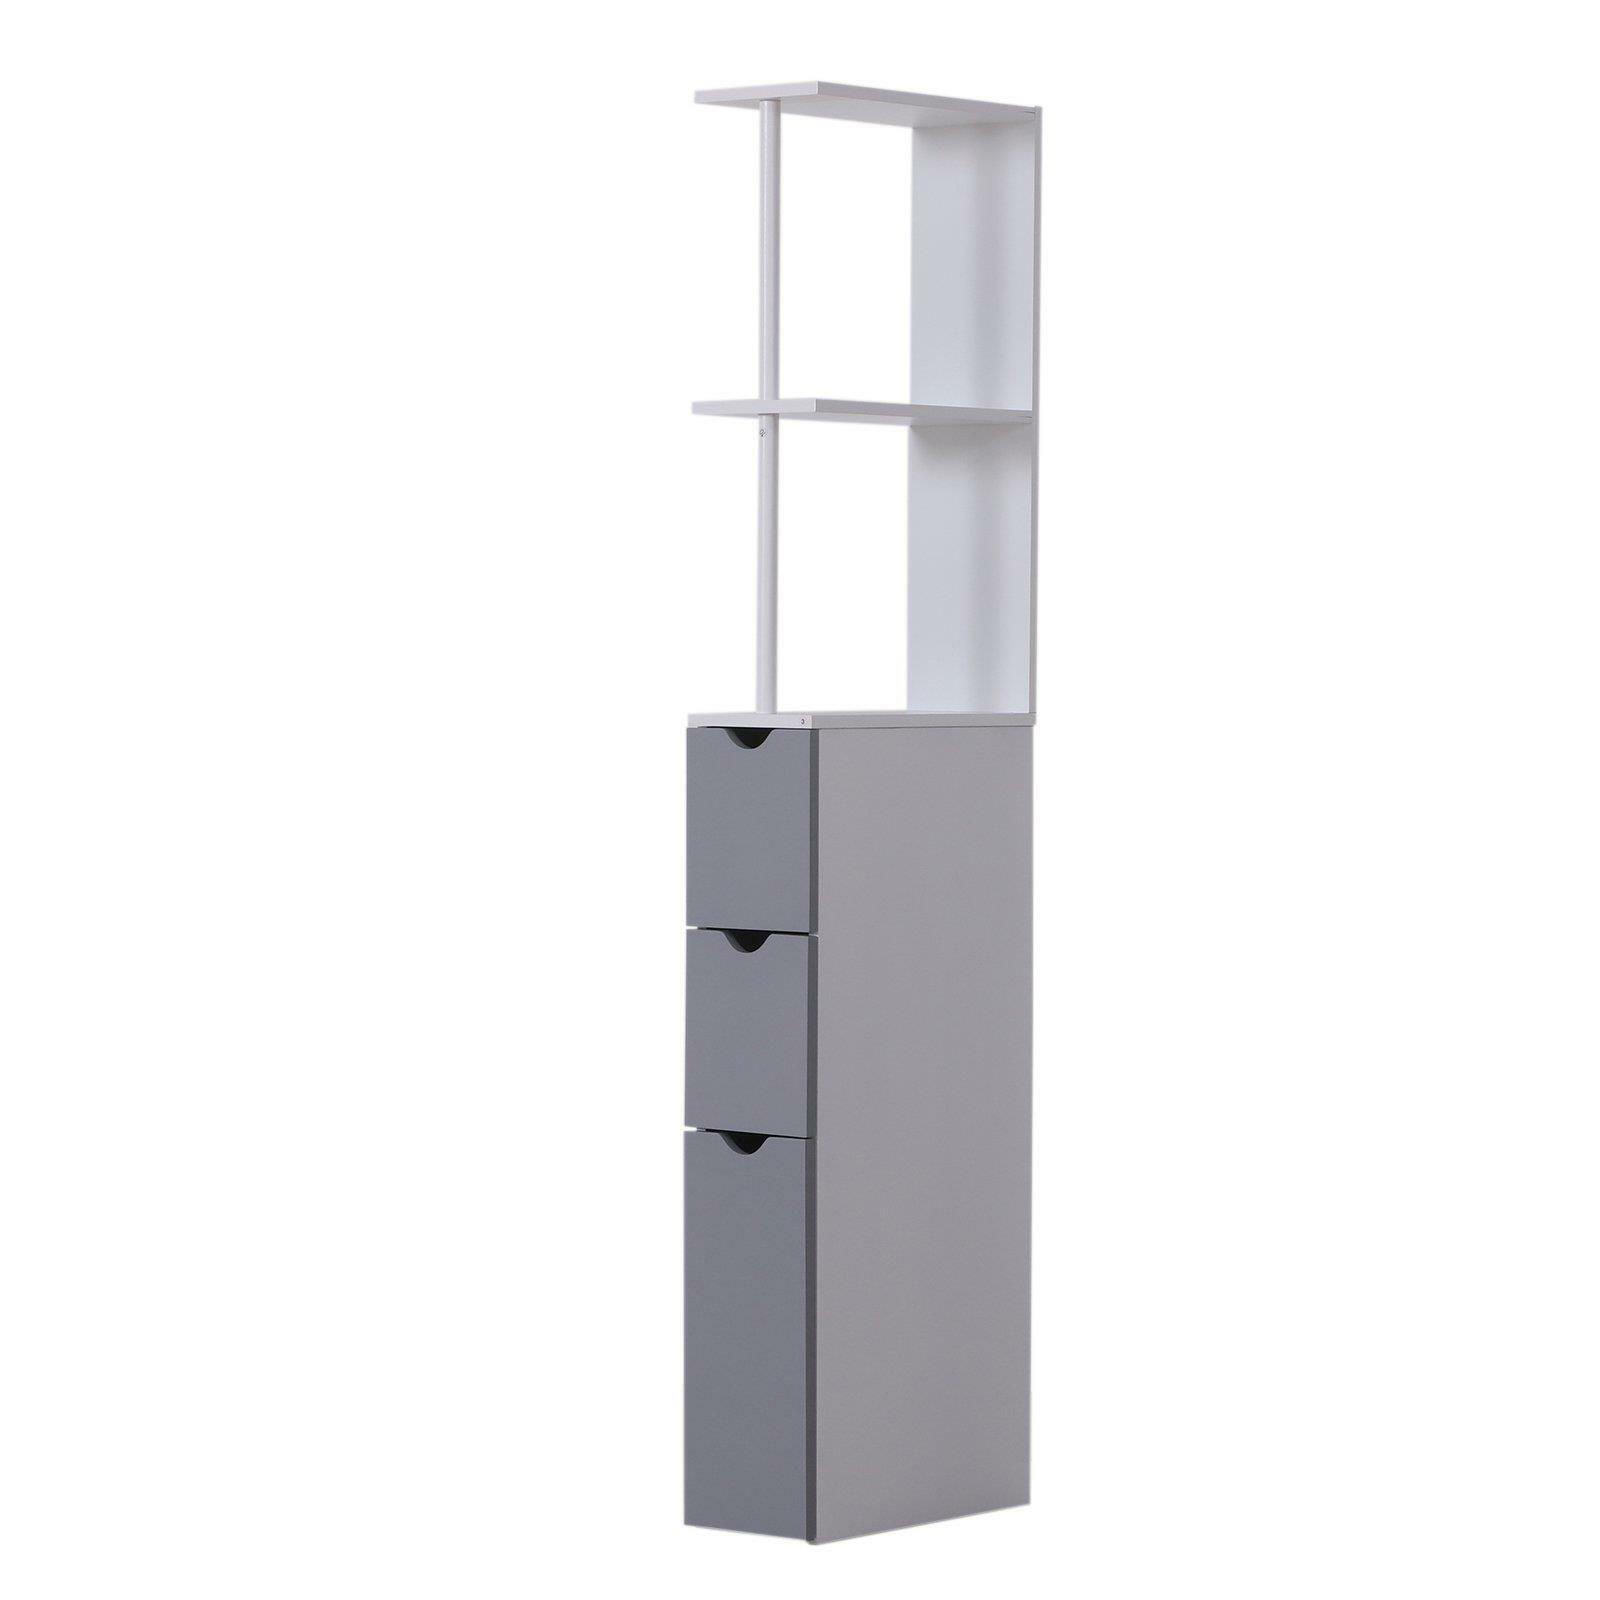 Slim Profile Bathroom Cabinet Tall Thin